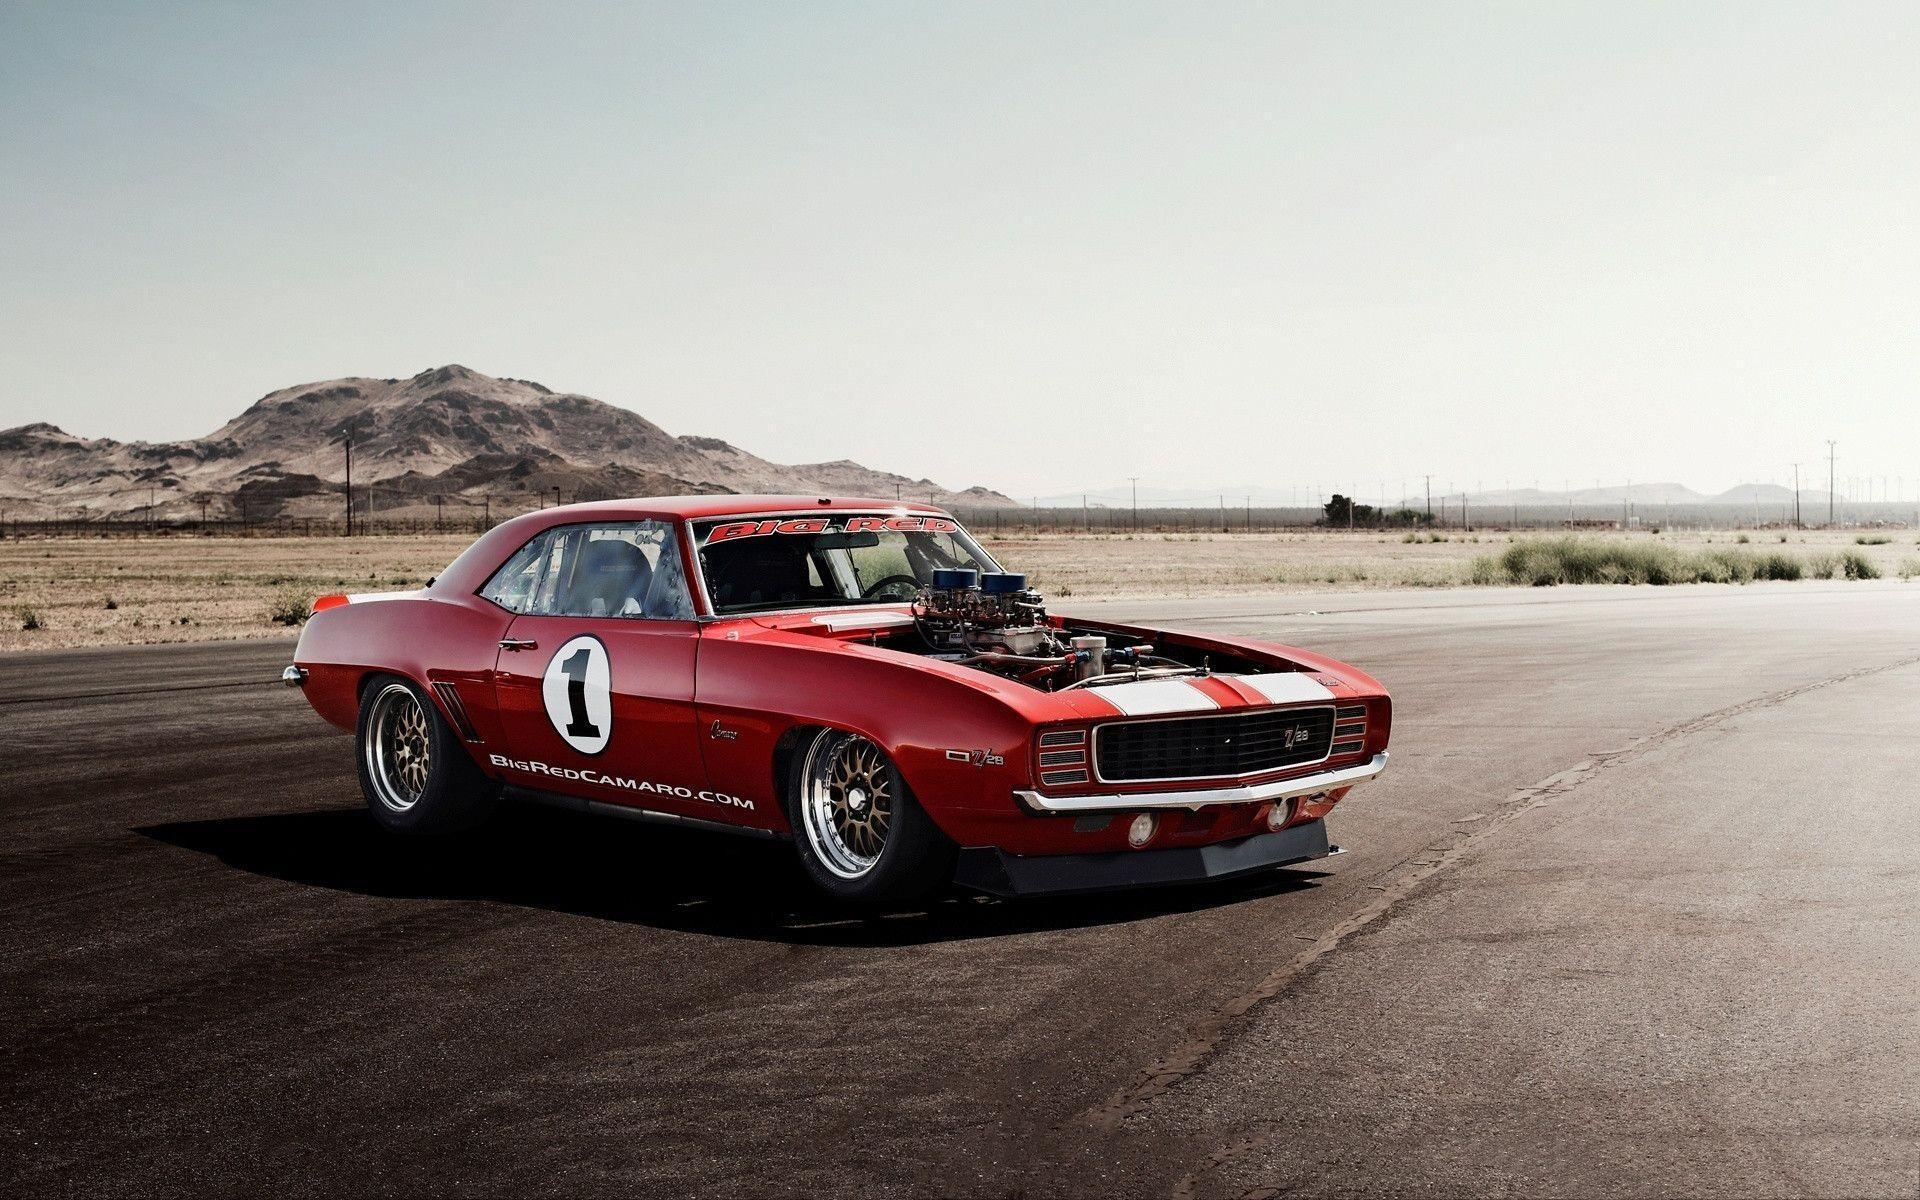 1969 Camaro Wallpapers Top Free 1969 Camaro Backgrounds